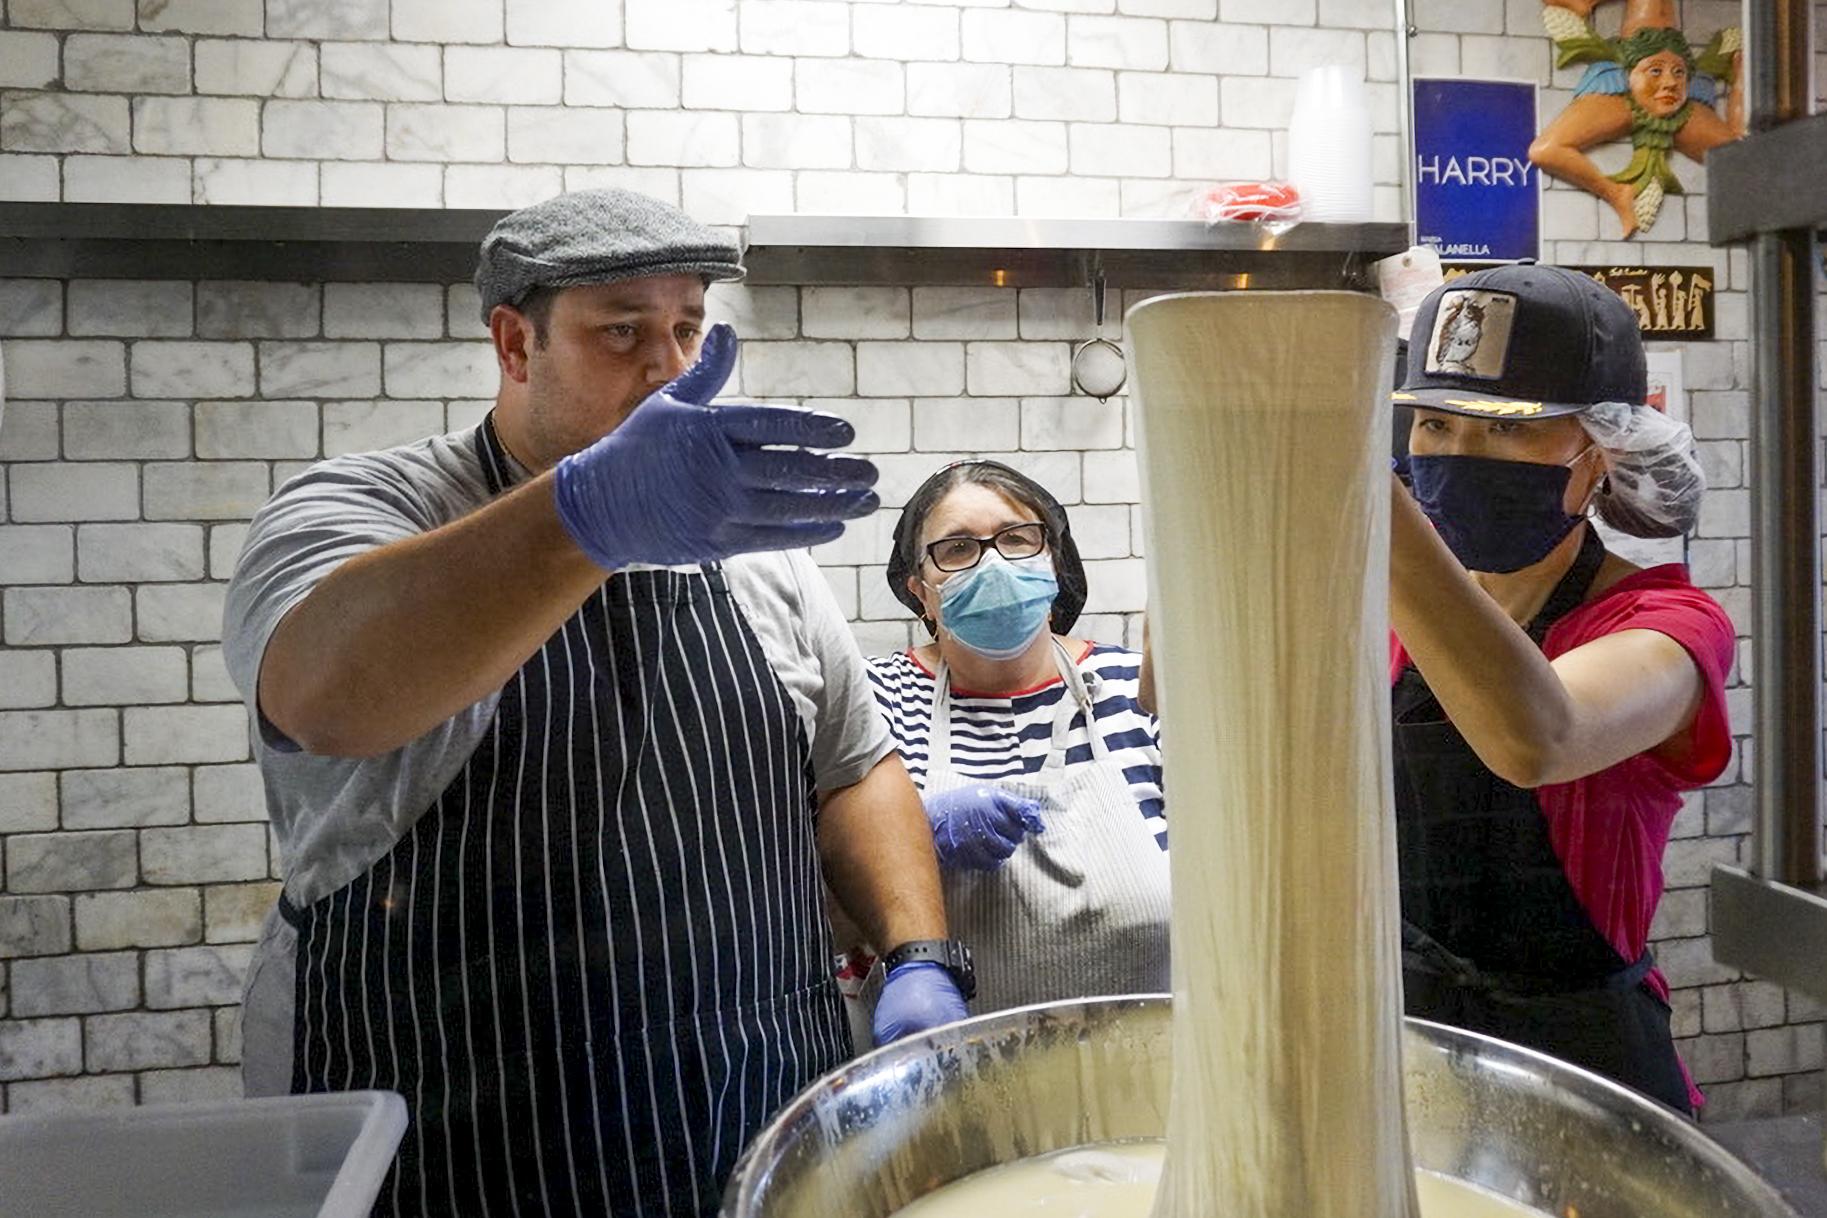 Nonnas Adelina Orazzo, center, and Yumi Komatsudaira, right, make fresh mozzarella with vendor Anthony Agostino on Thursday ahead of Enoteca Maria's grand reopening.